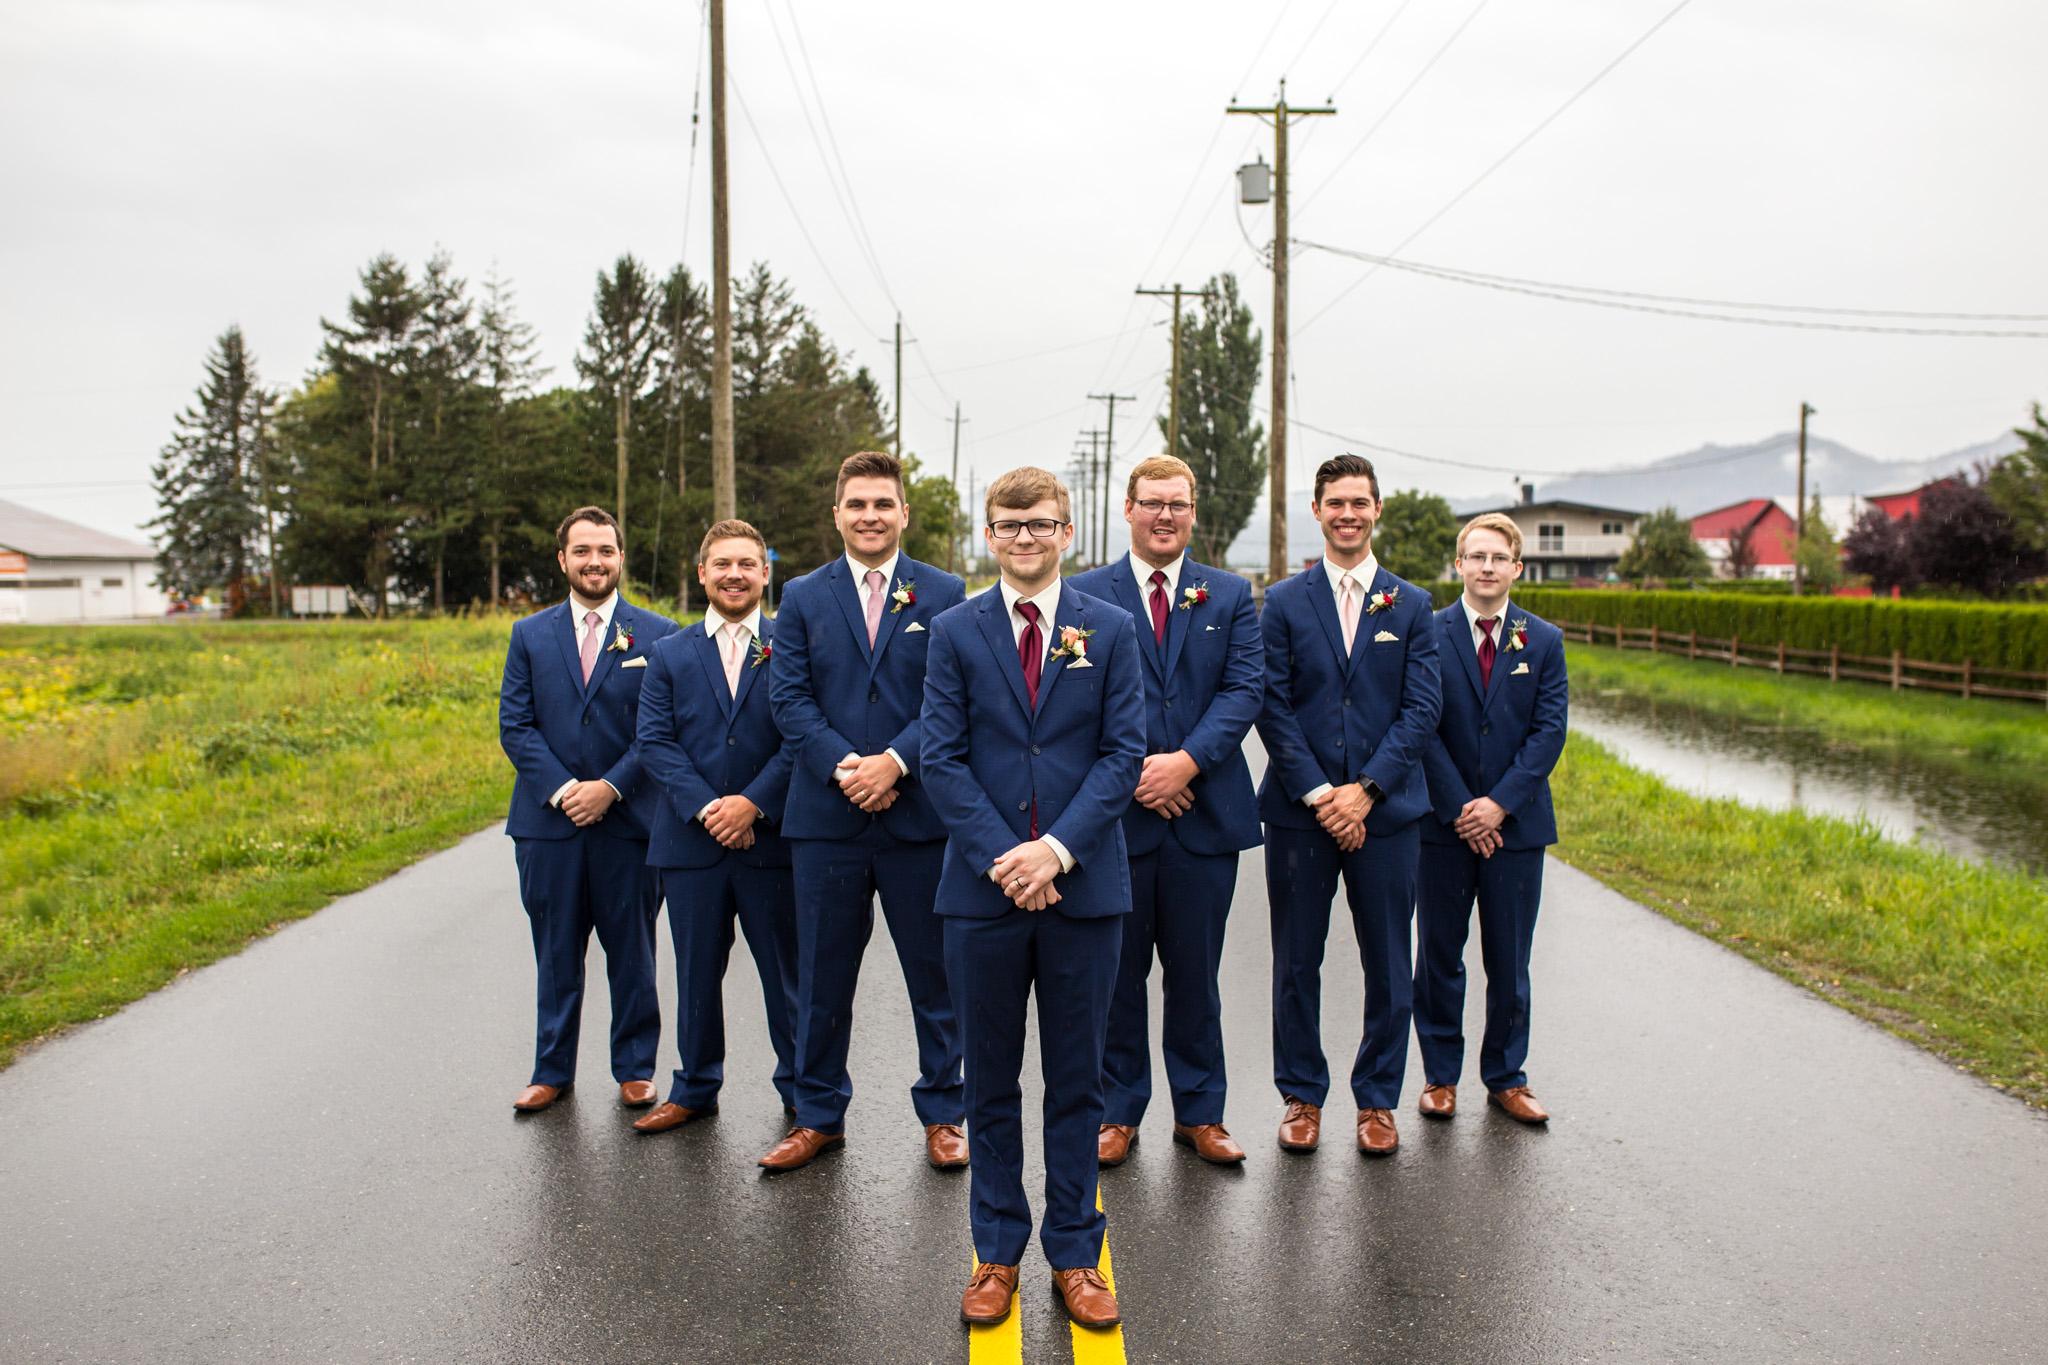 Abbotsford Wedding Photographer-48.jpg